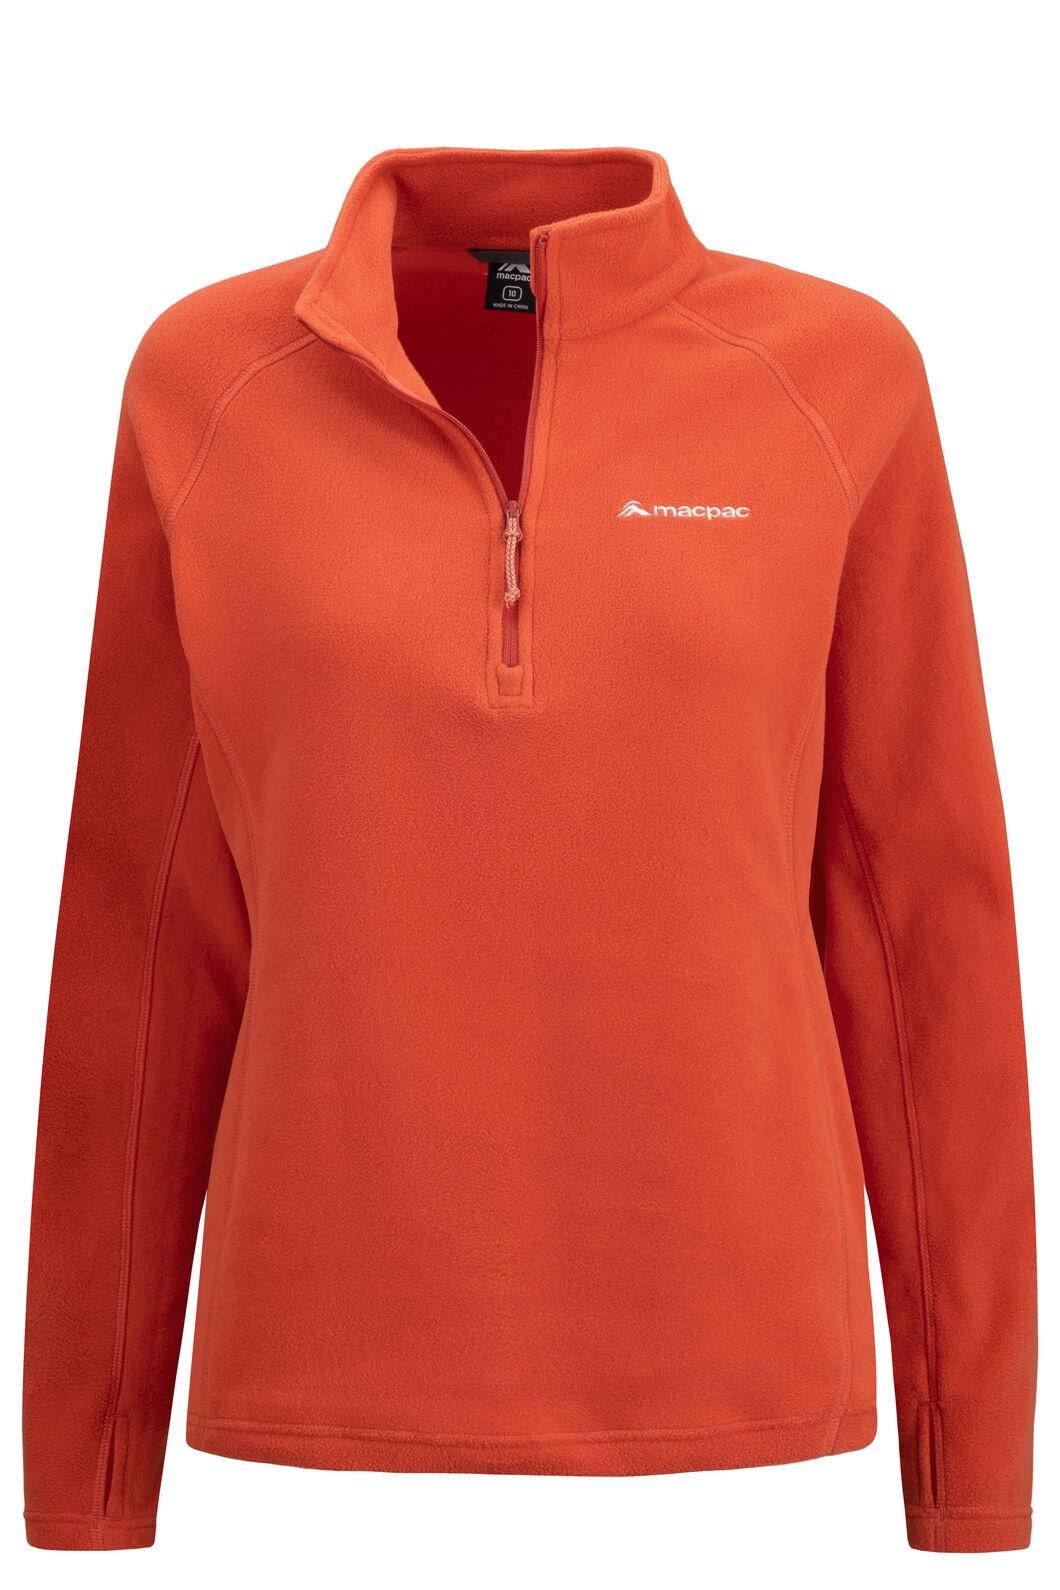 Macpac Women's Tui Polartec® Micro Fleece® Pullover, Habanero, hi-res